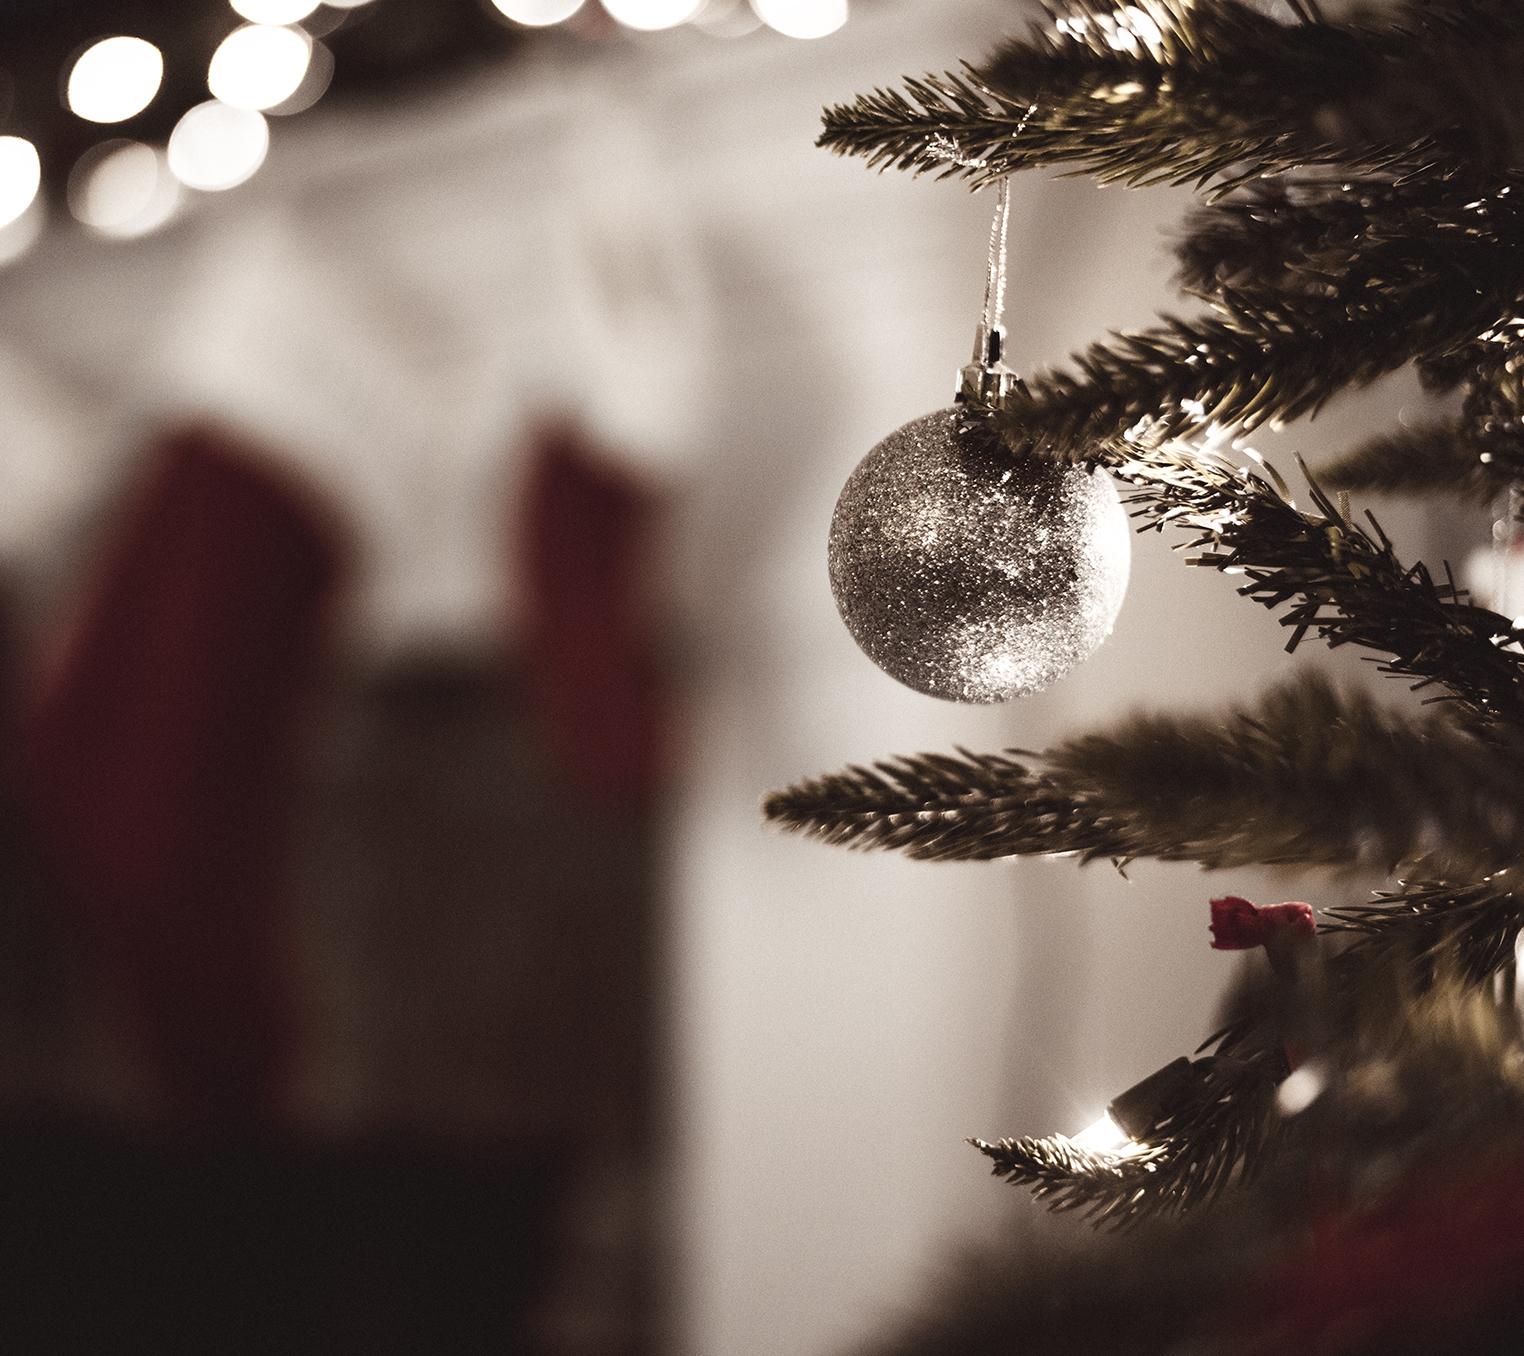 Christmas tree & ornament